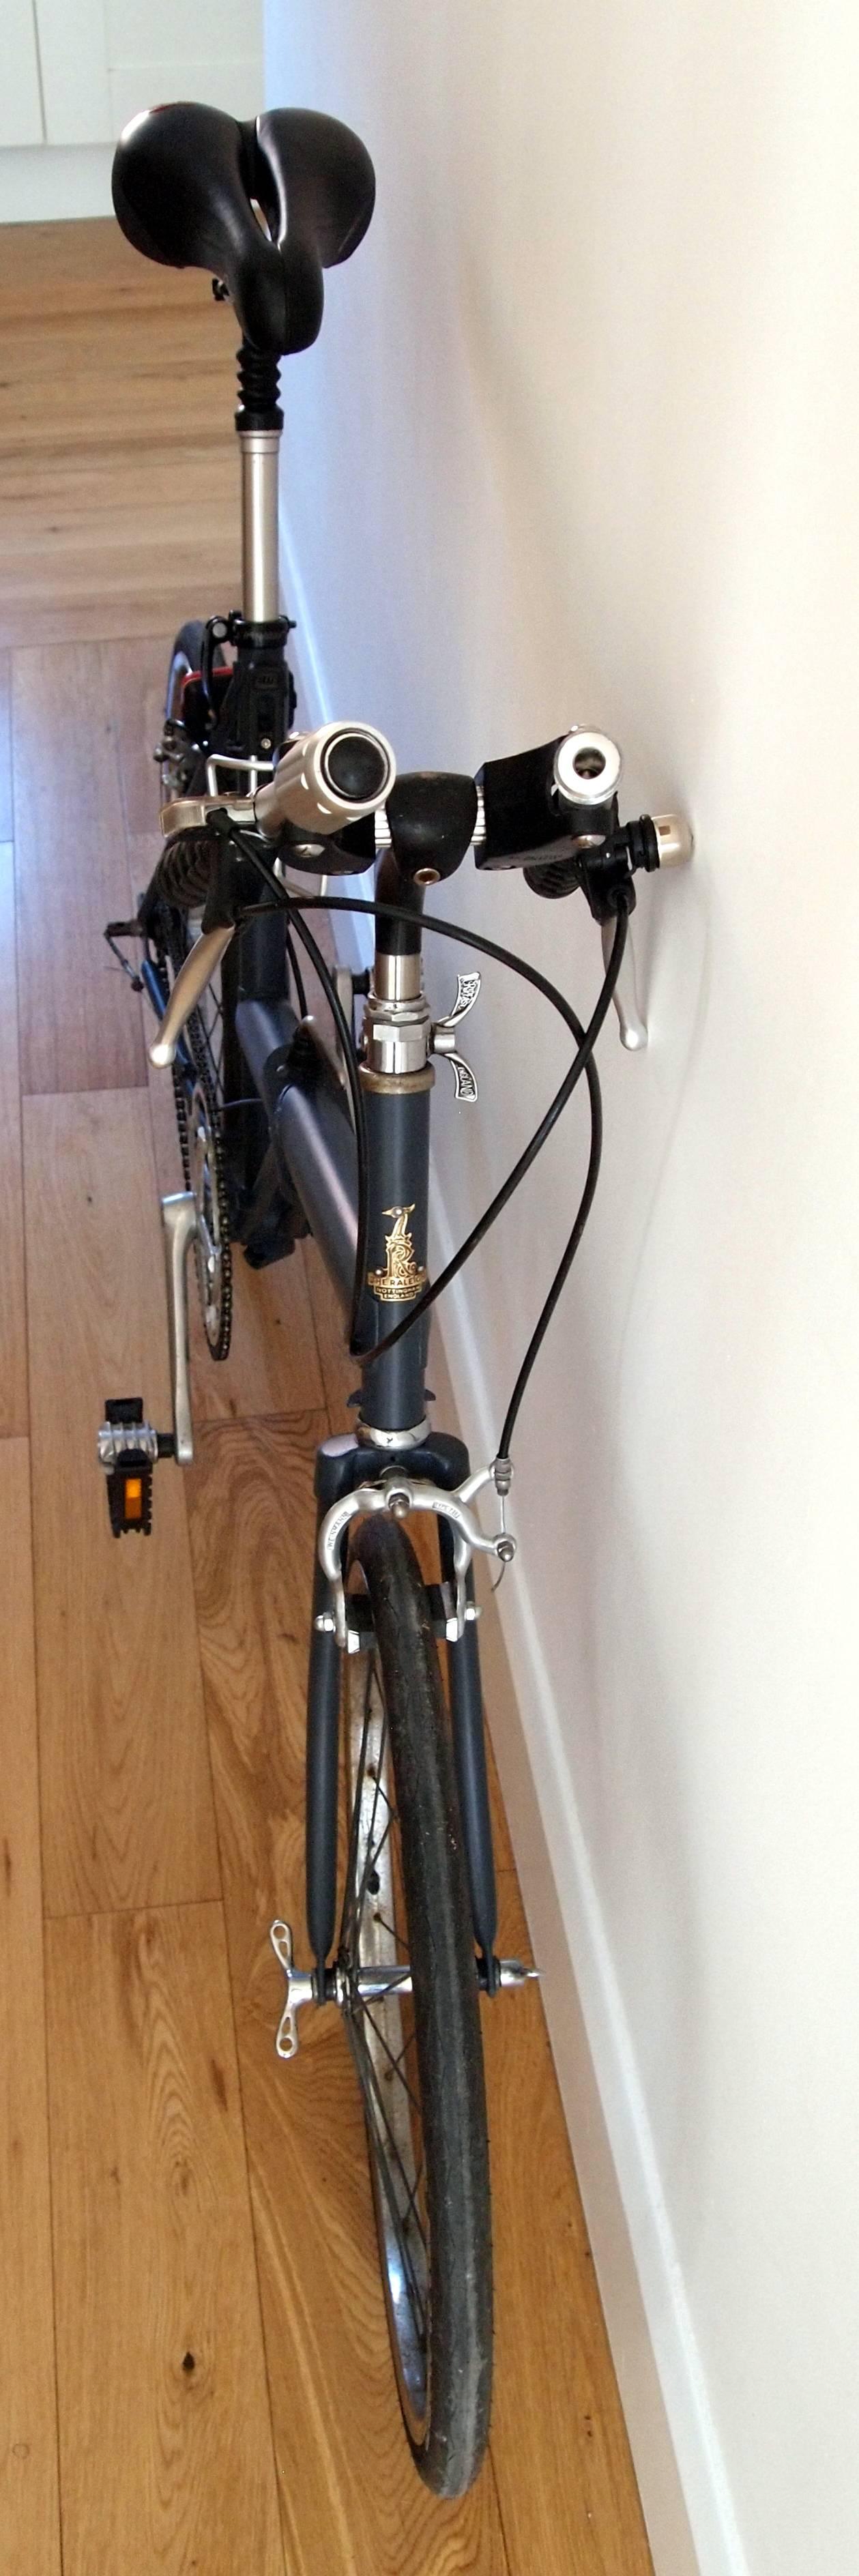 'Thin bike'